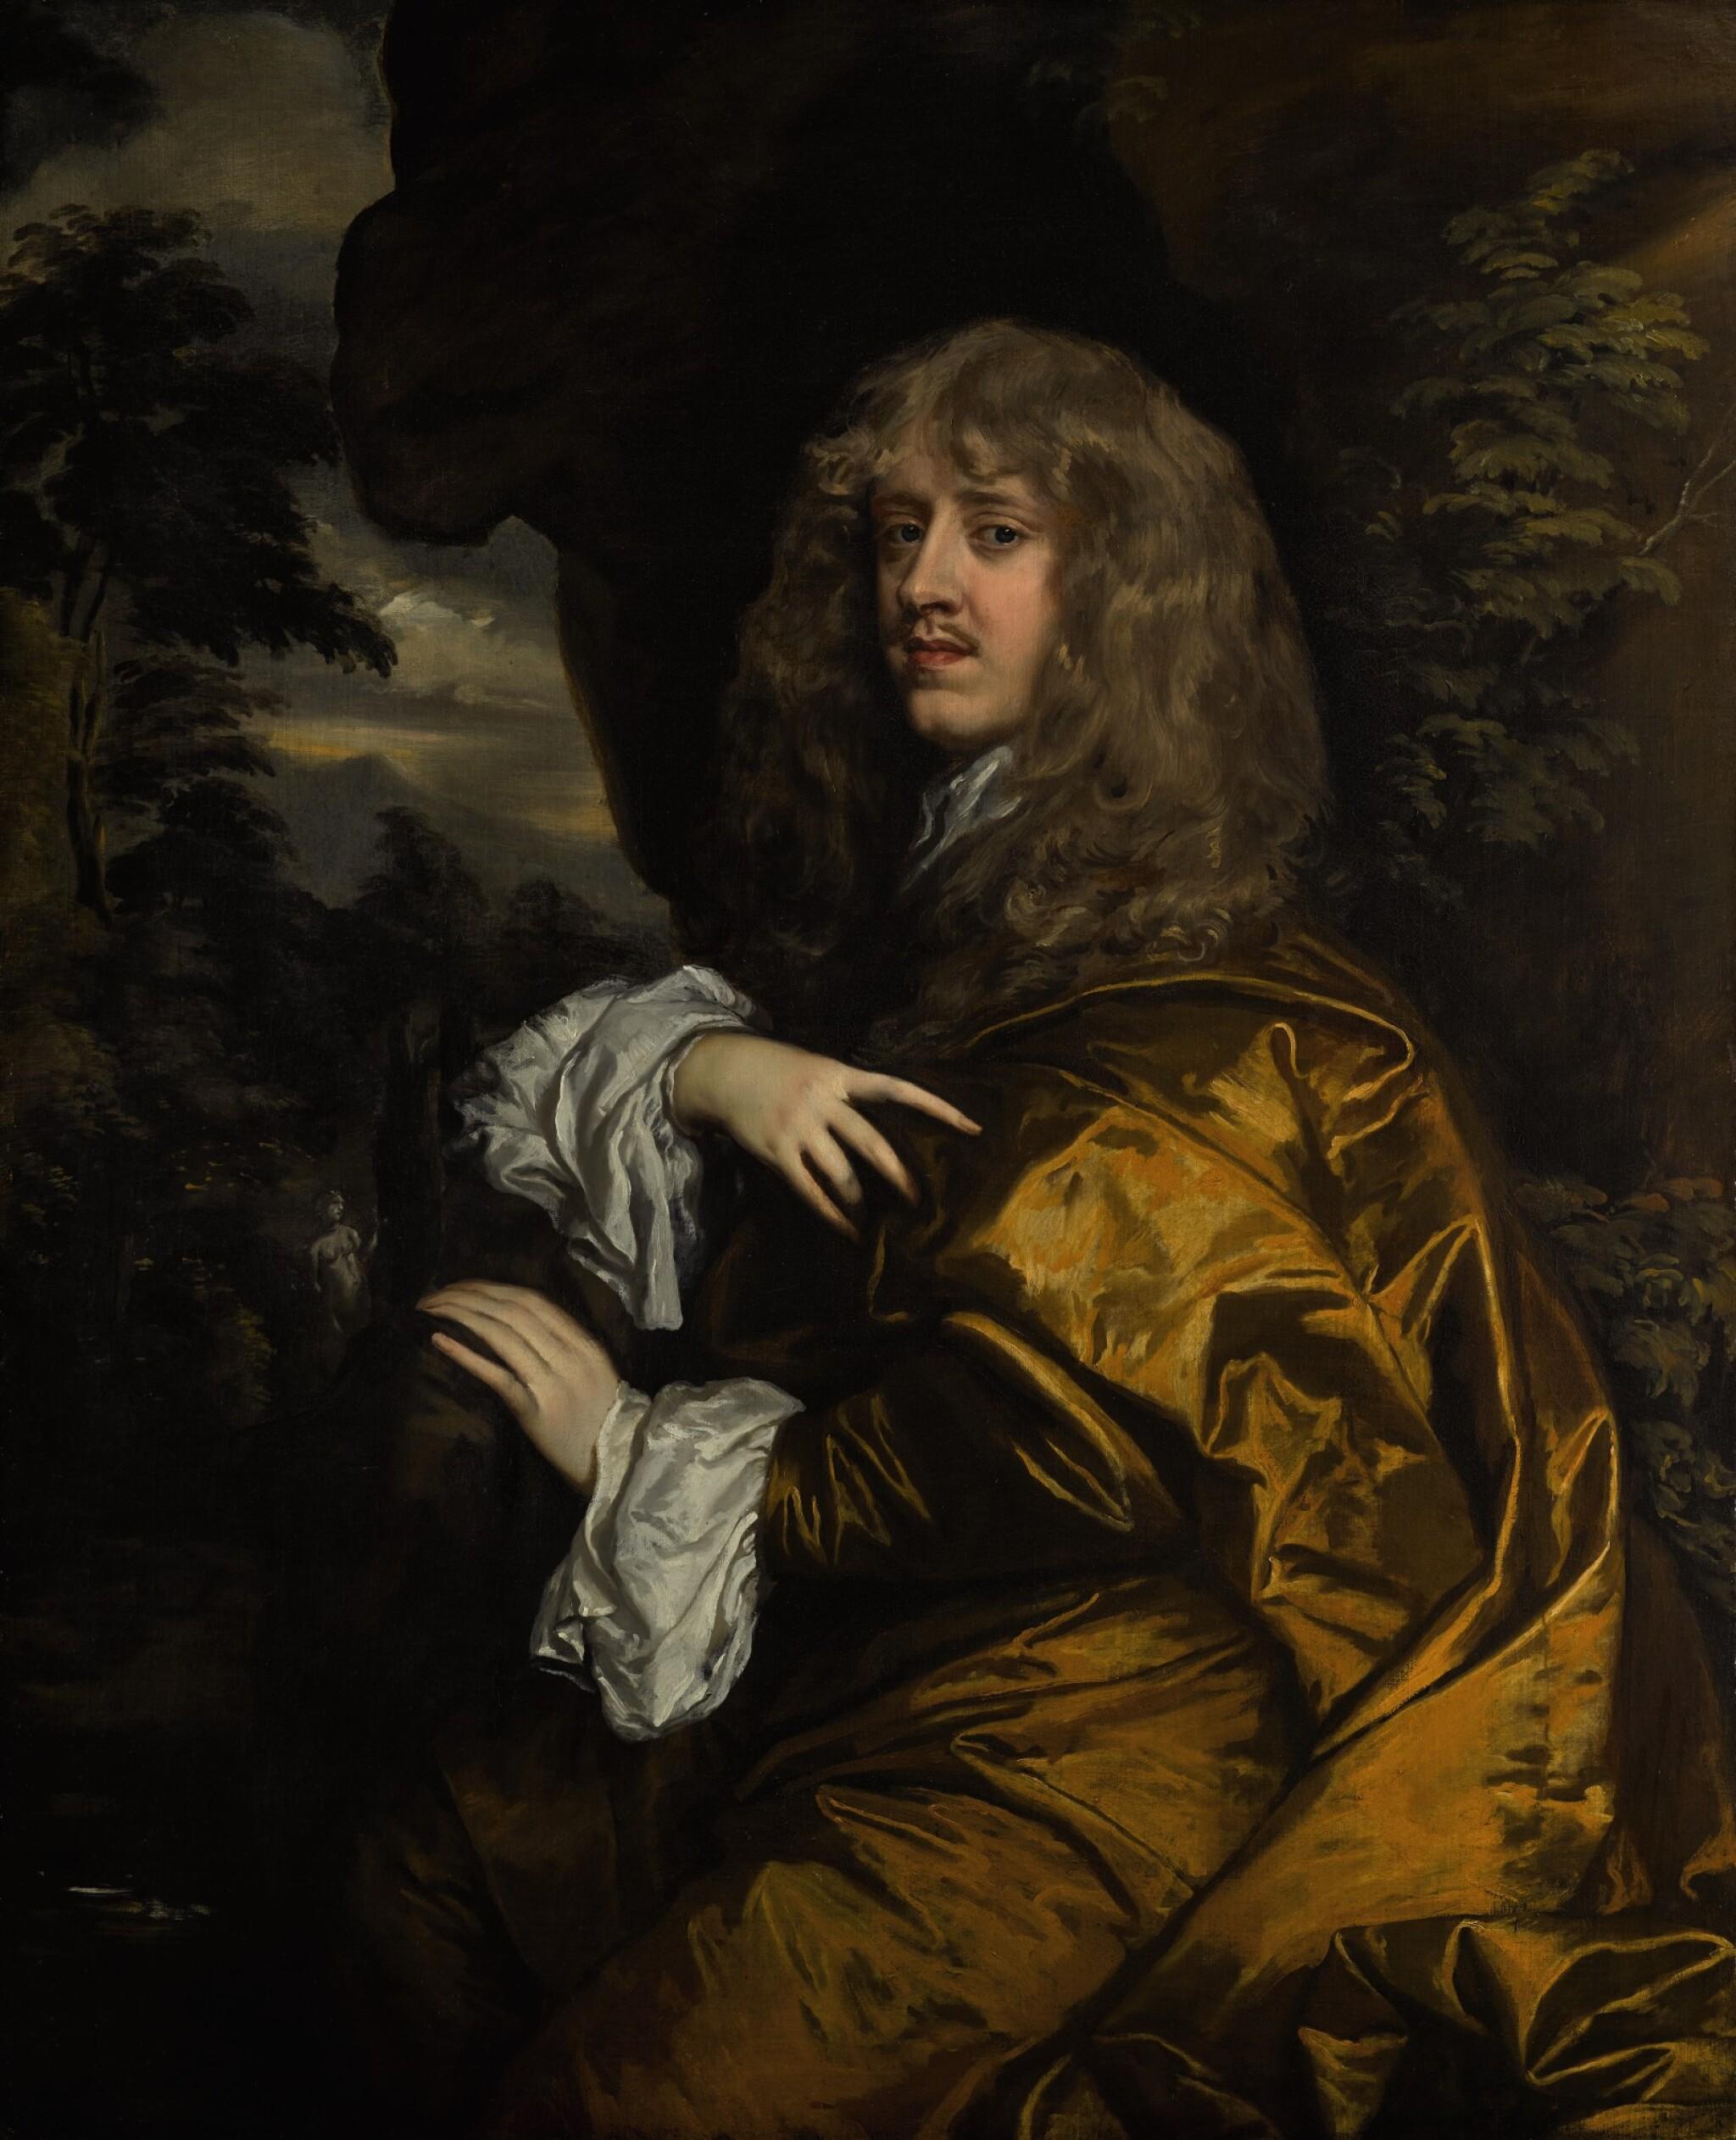 View full screen - View 1 of Lot 13. Portrait of Philip Stanhope, 2nd Earl of Chesterfield (1634–1714) |《菲利普・斯坦霍普,切斯特菲爾德伯爵二世(1634–1714年)肖像》.